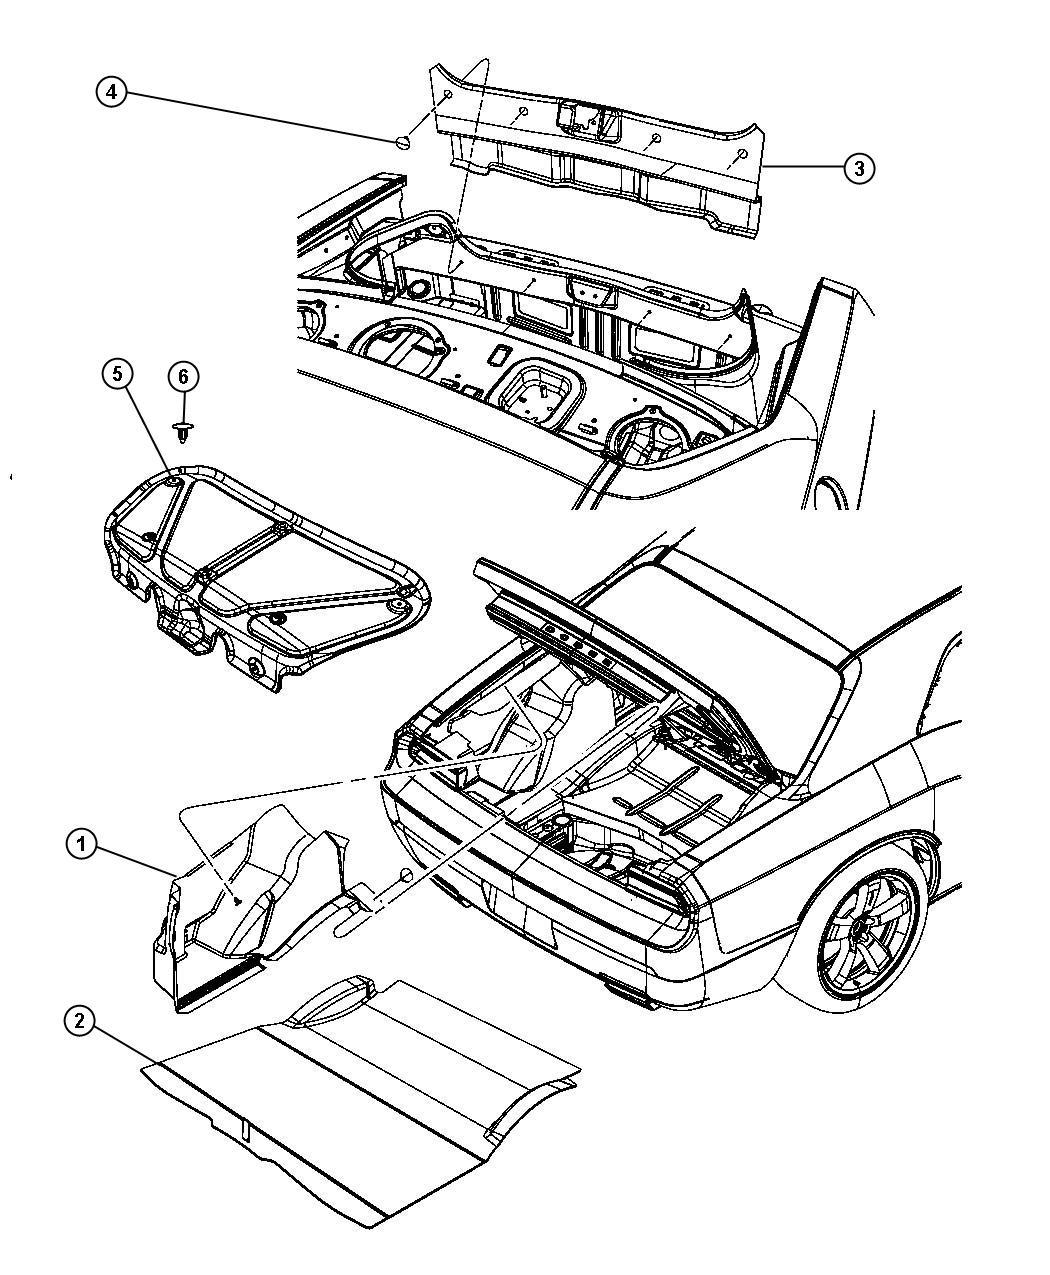 2012 Dodge Challenger Cover. Decklid interior trim. [trunk